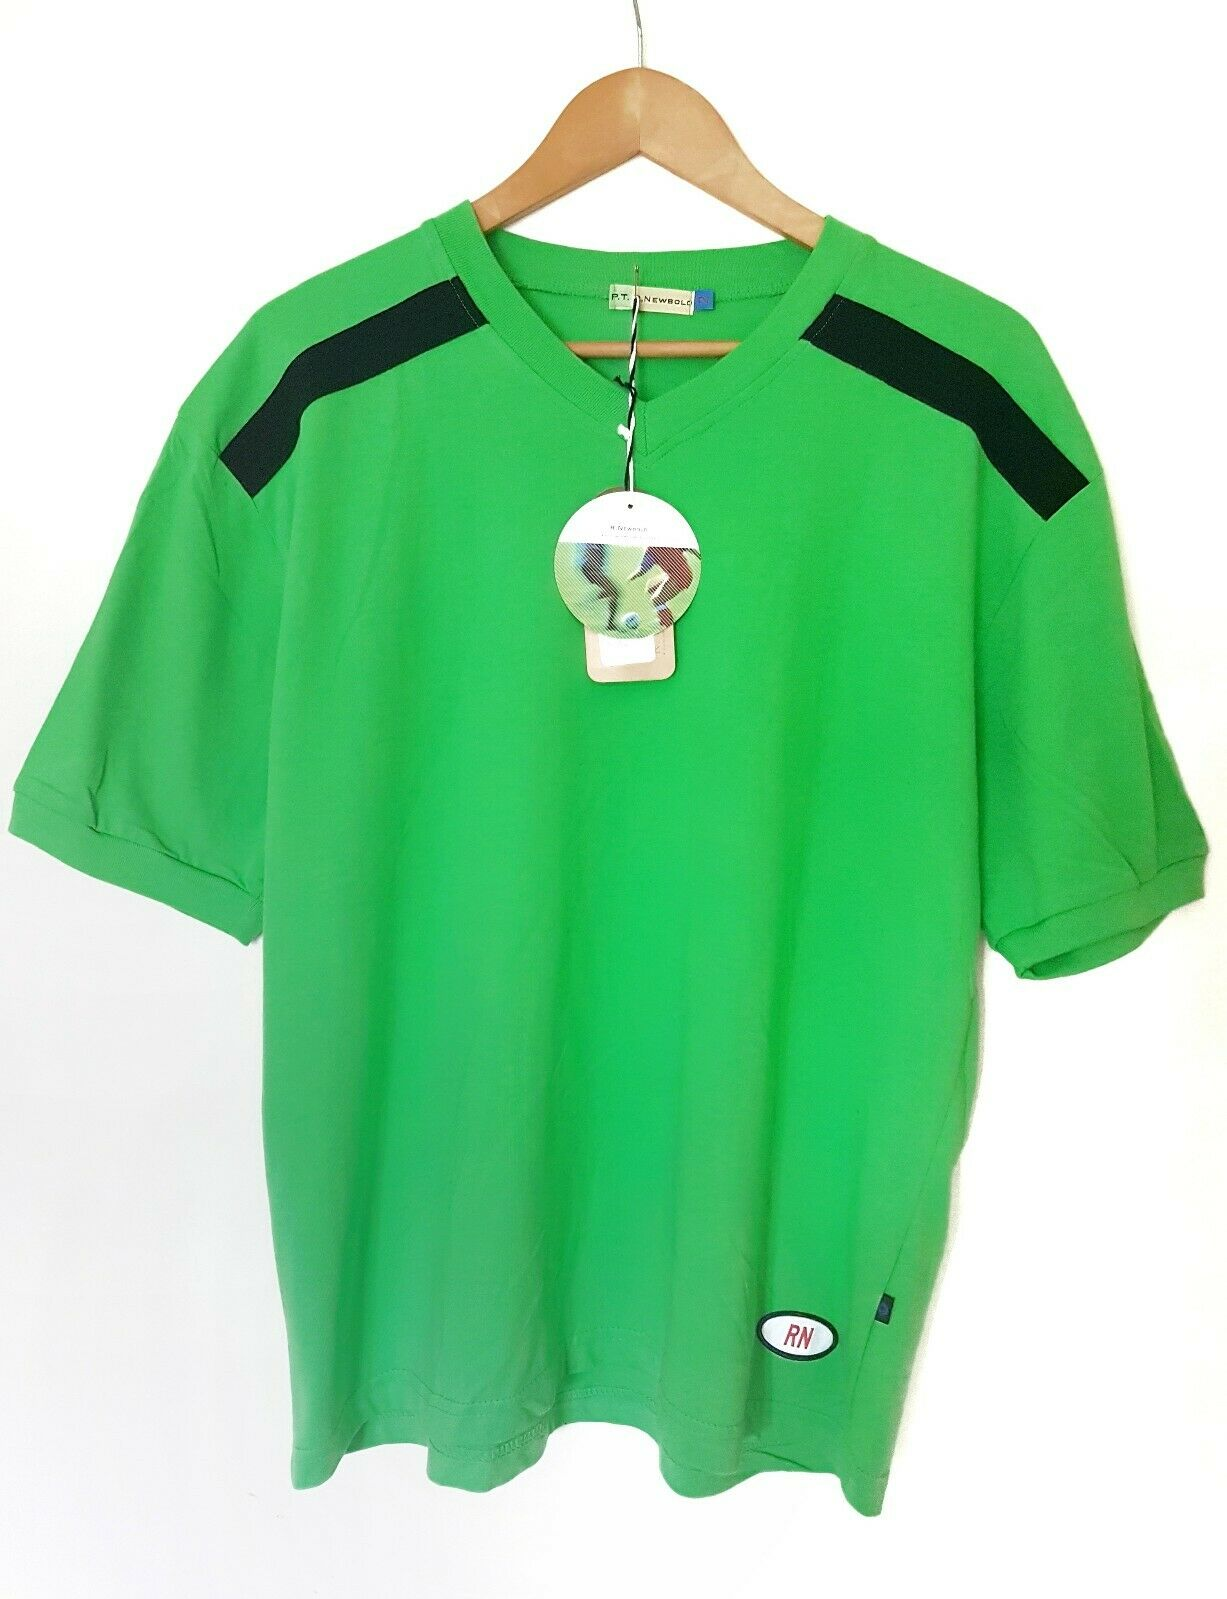 VINTAGE 90s R. Newbold P.T Paul Smith Smith Smith verde Nero A Righe Tasca T-SHIRT SPORT XL 6258c8